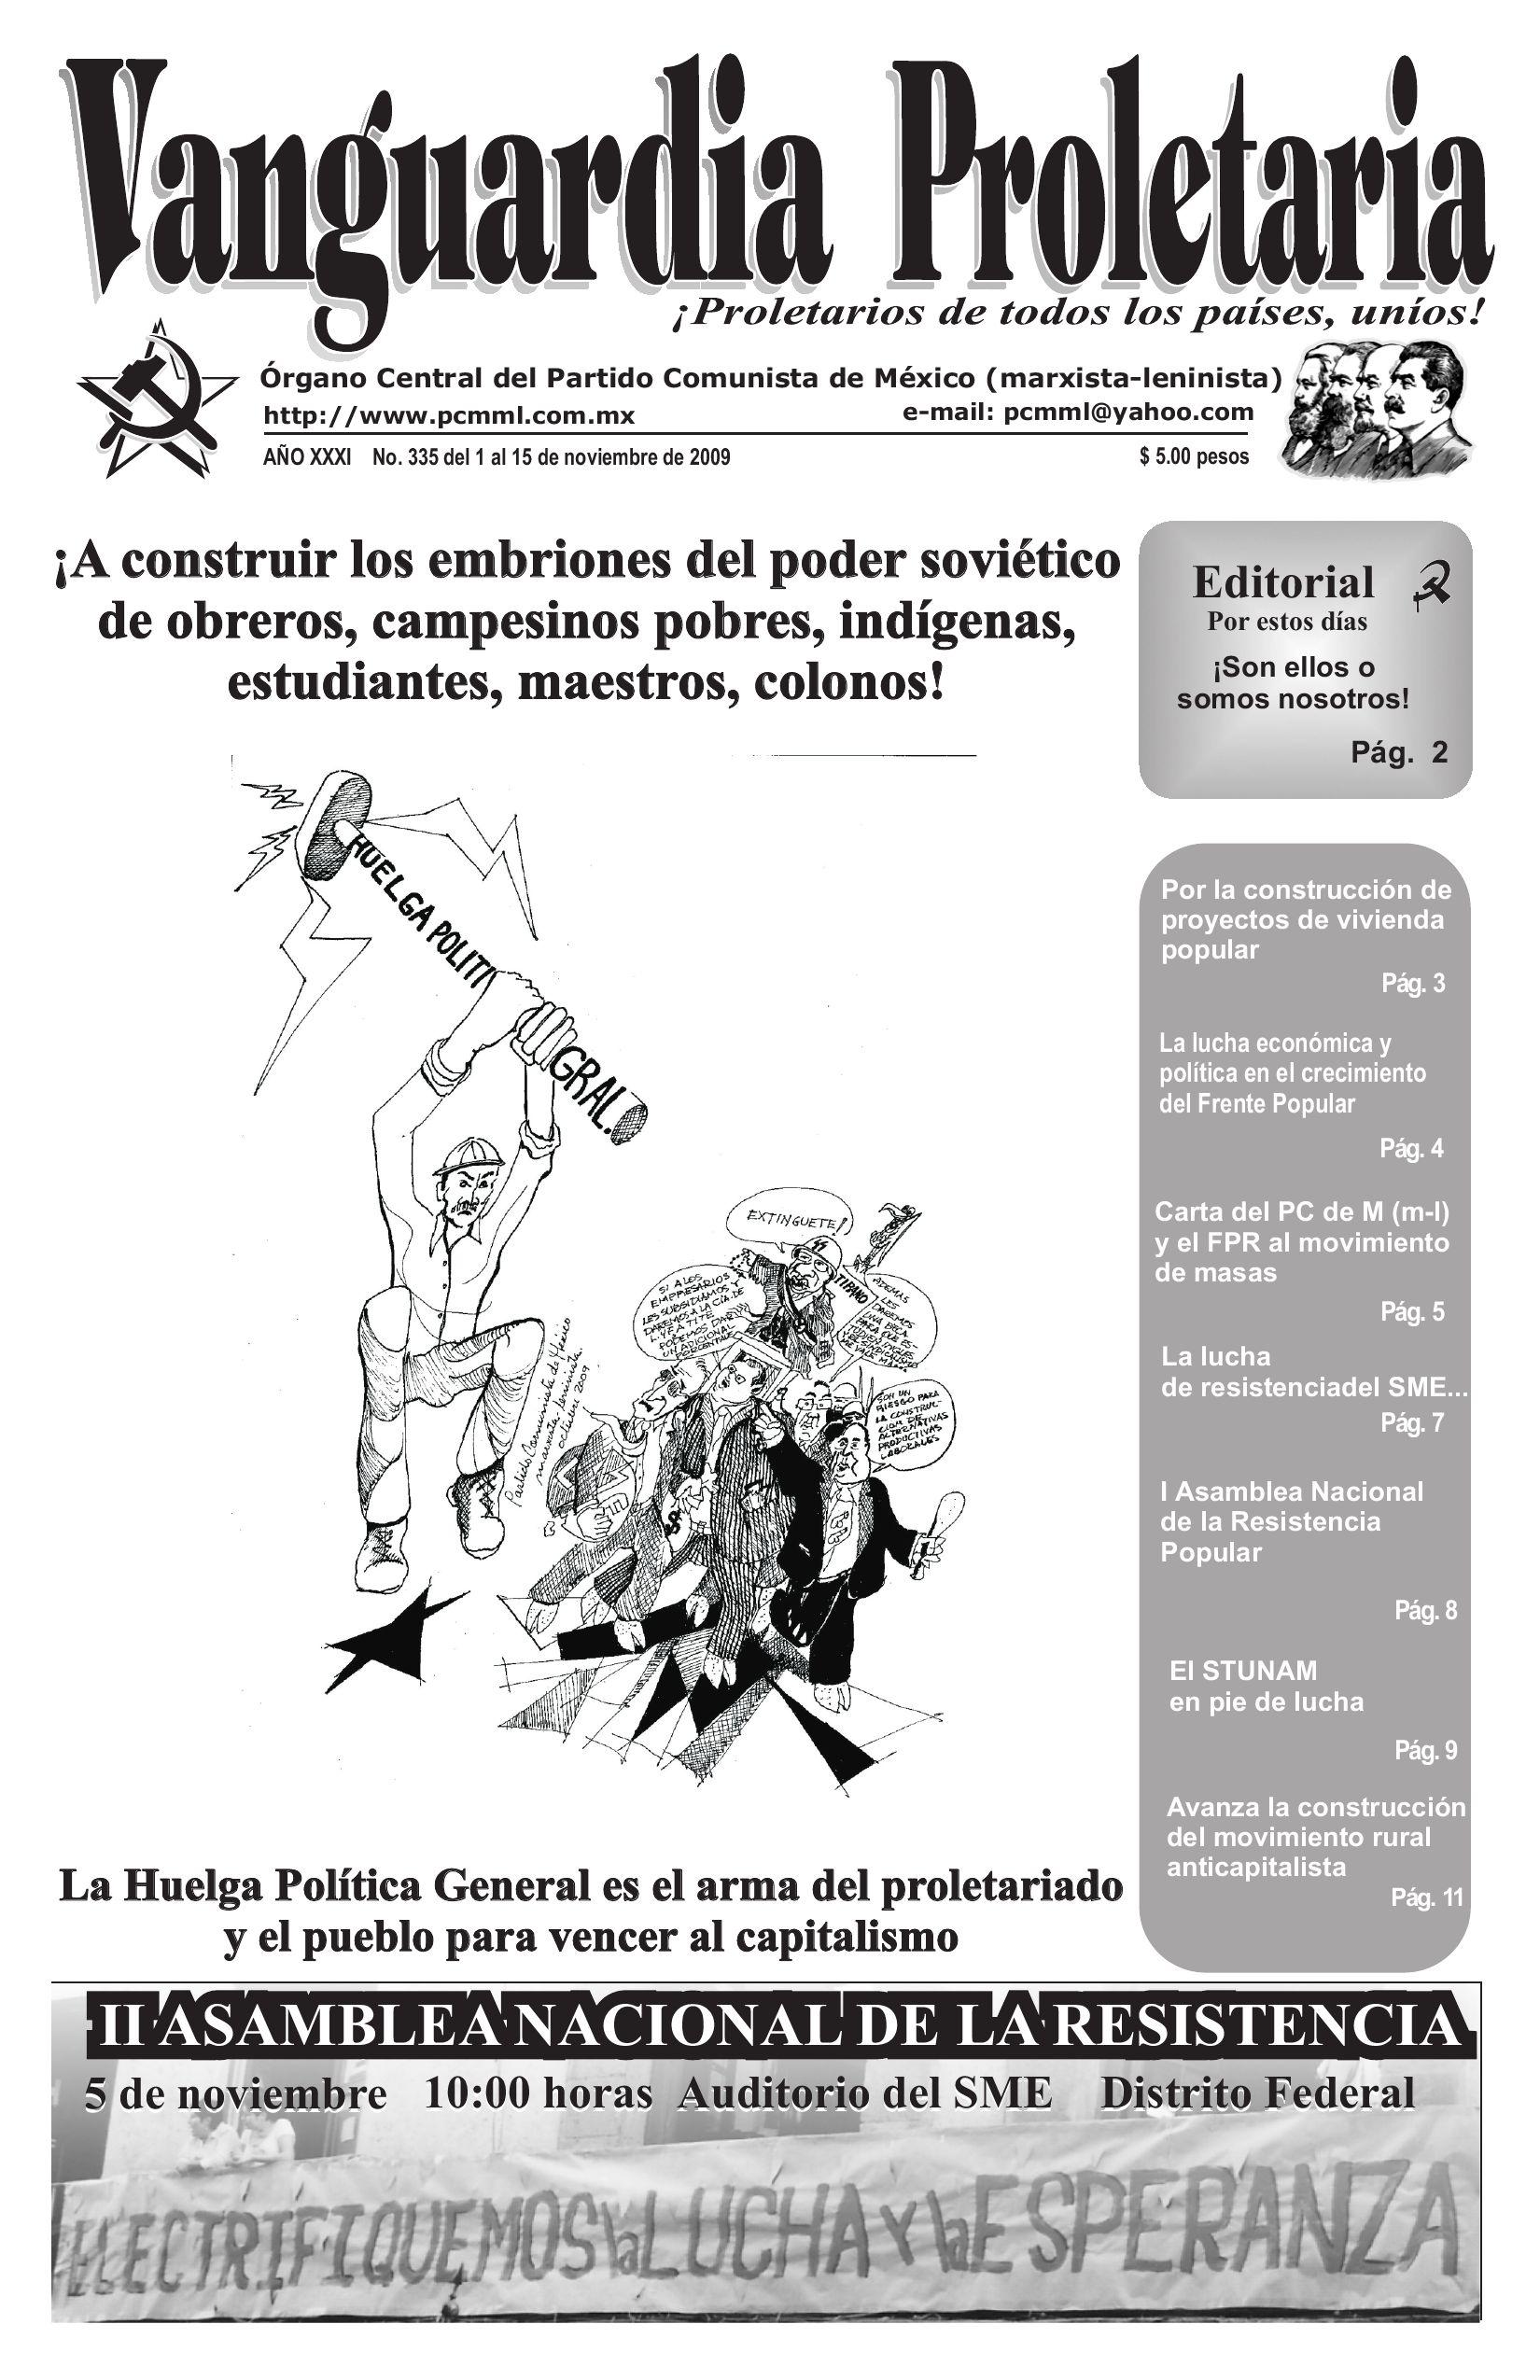 vanguardia proletaria 335 by vanguardia proletaria